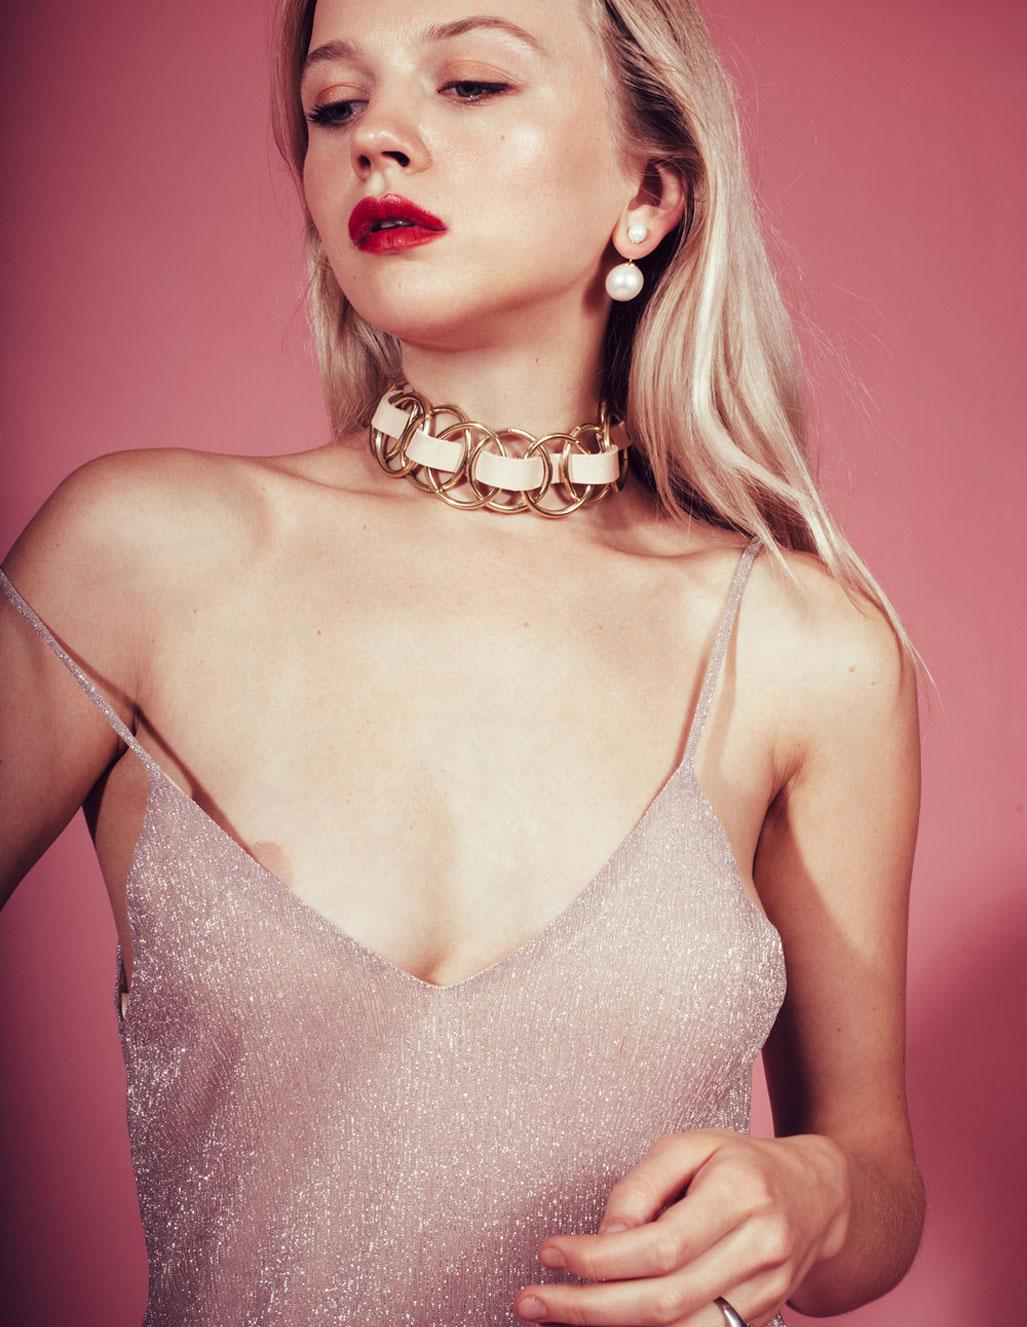 Светлана Легун в рекламной кампании Wicca collection 2016 / фото 04